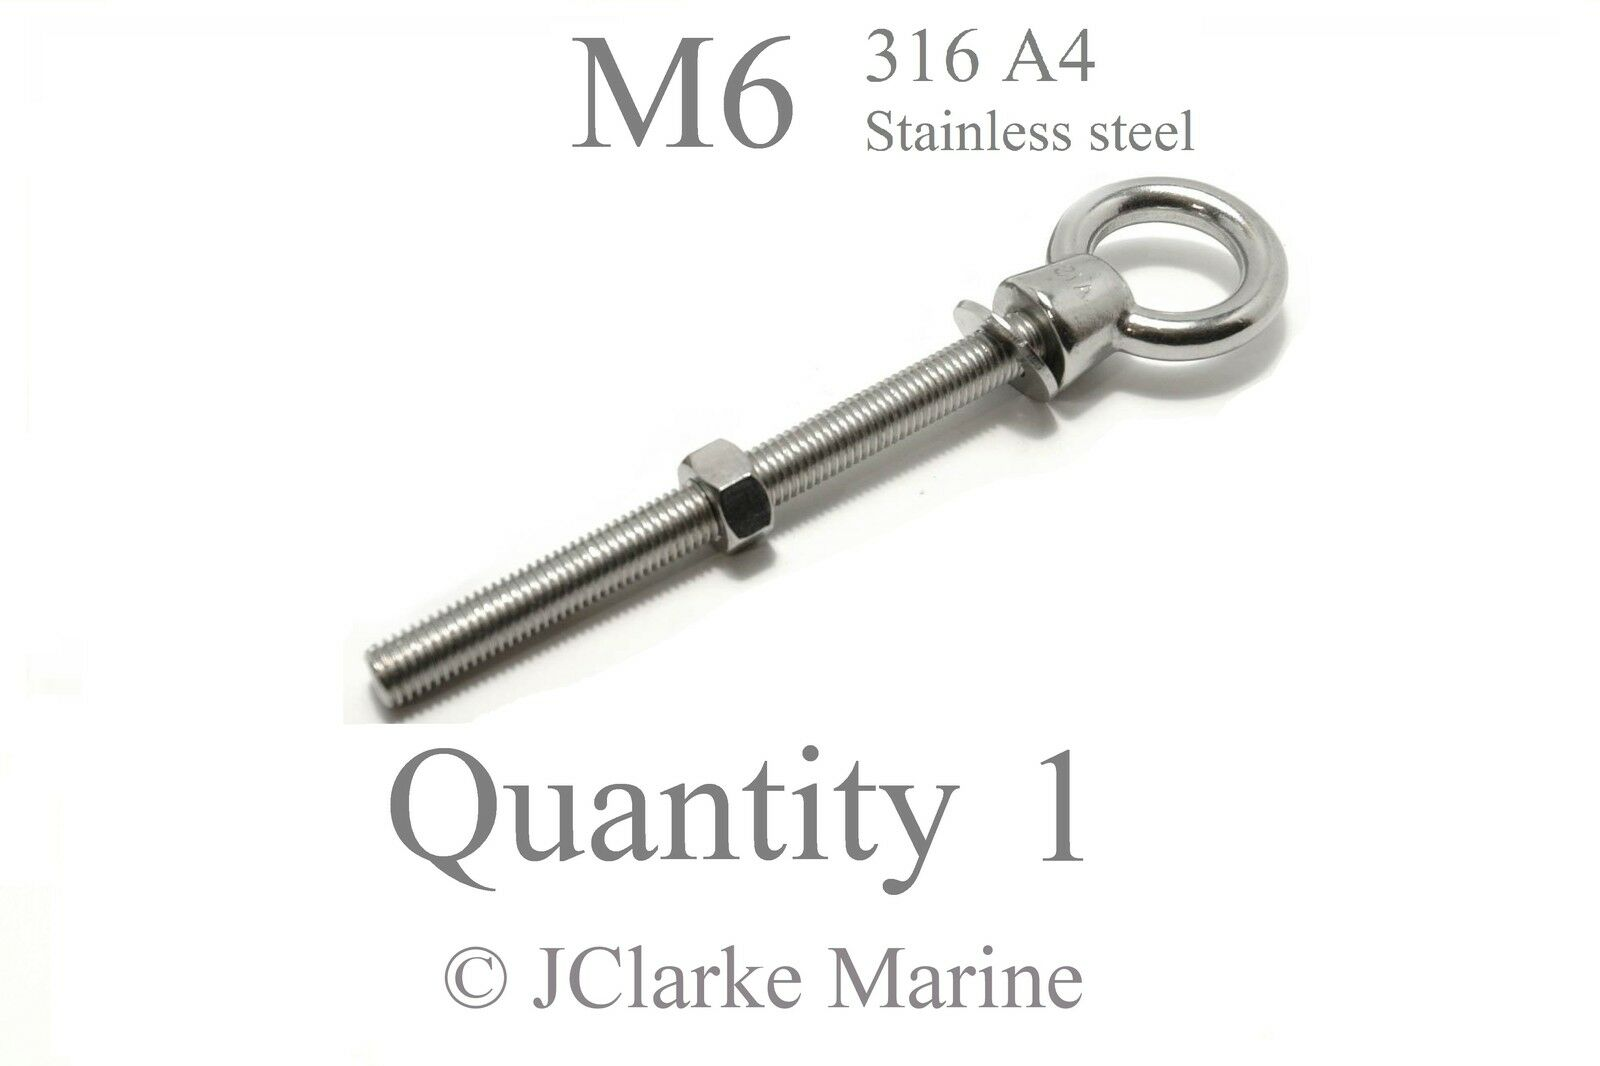 M6 Eye bolt & nut DIN 580 marine stainless steel (316 A4